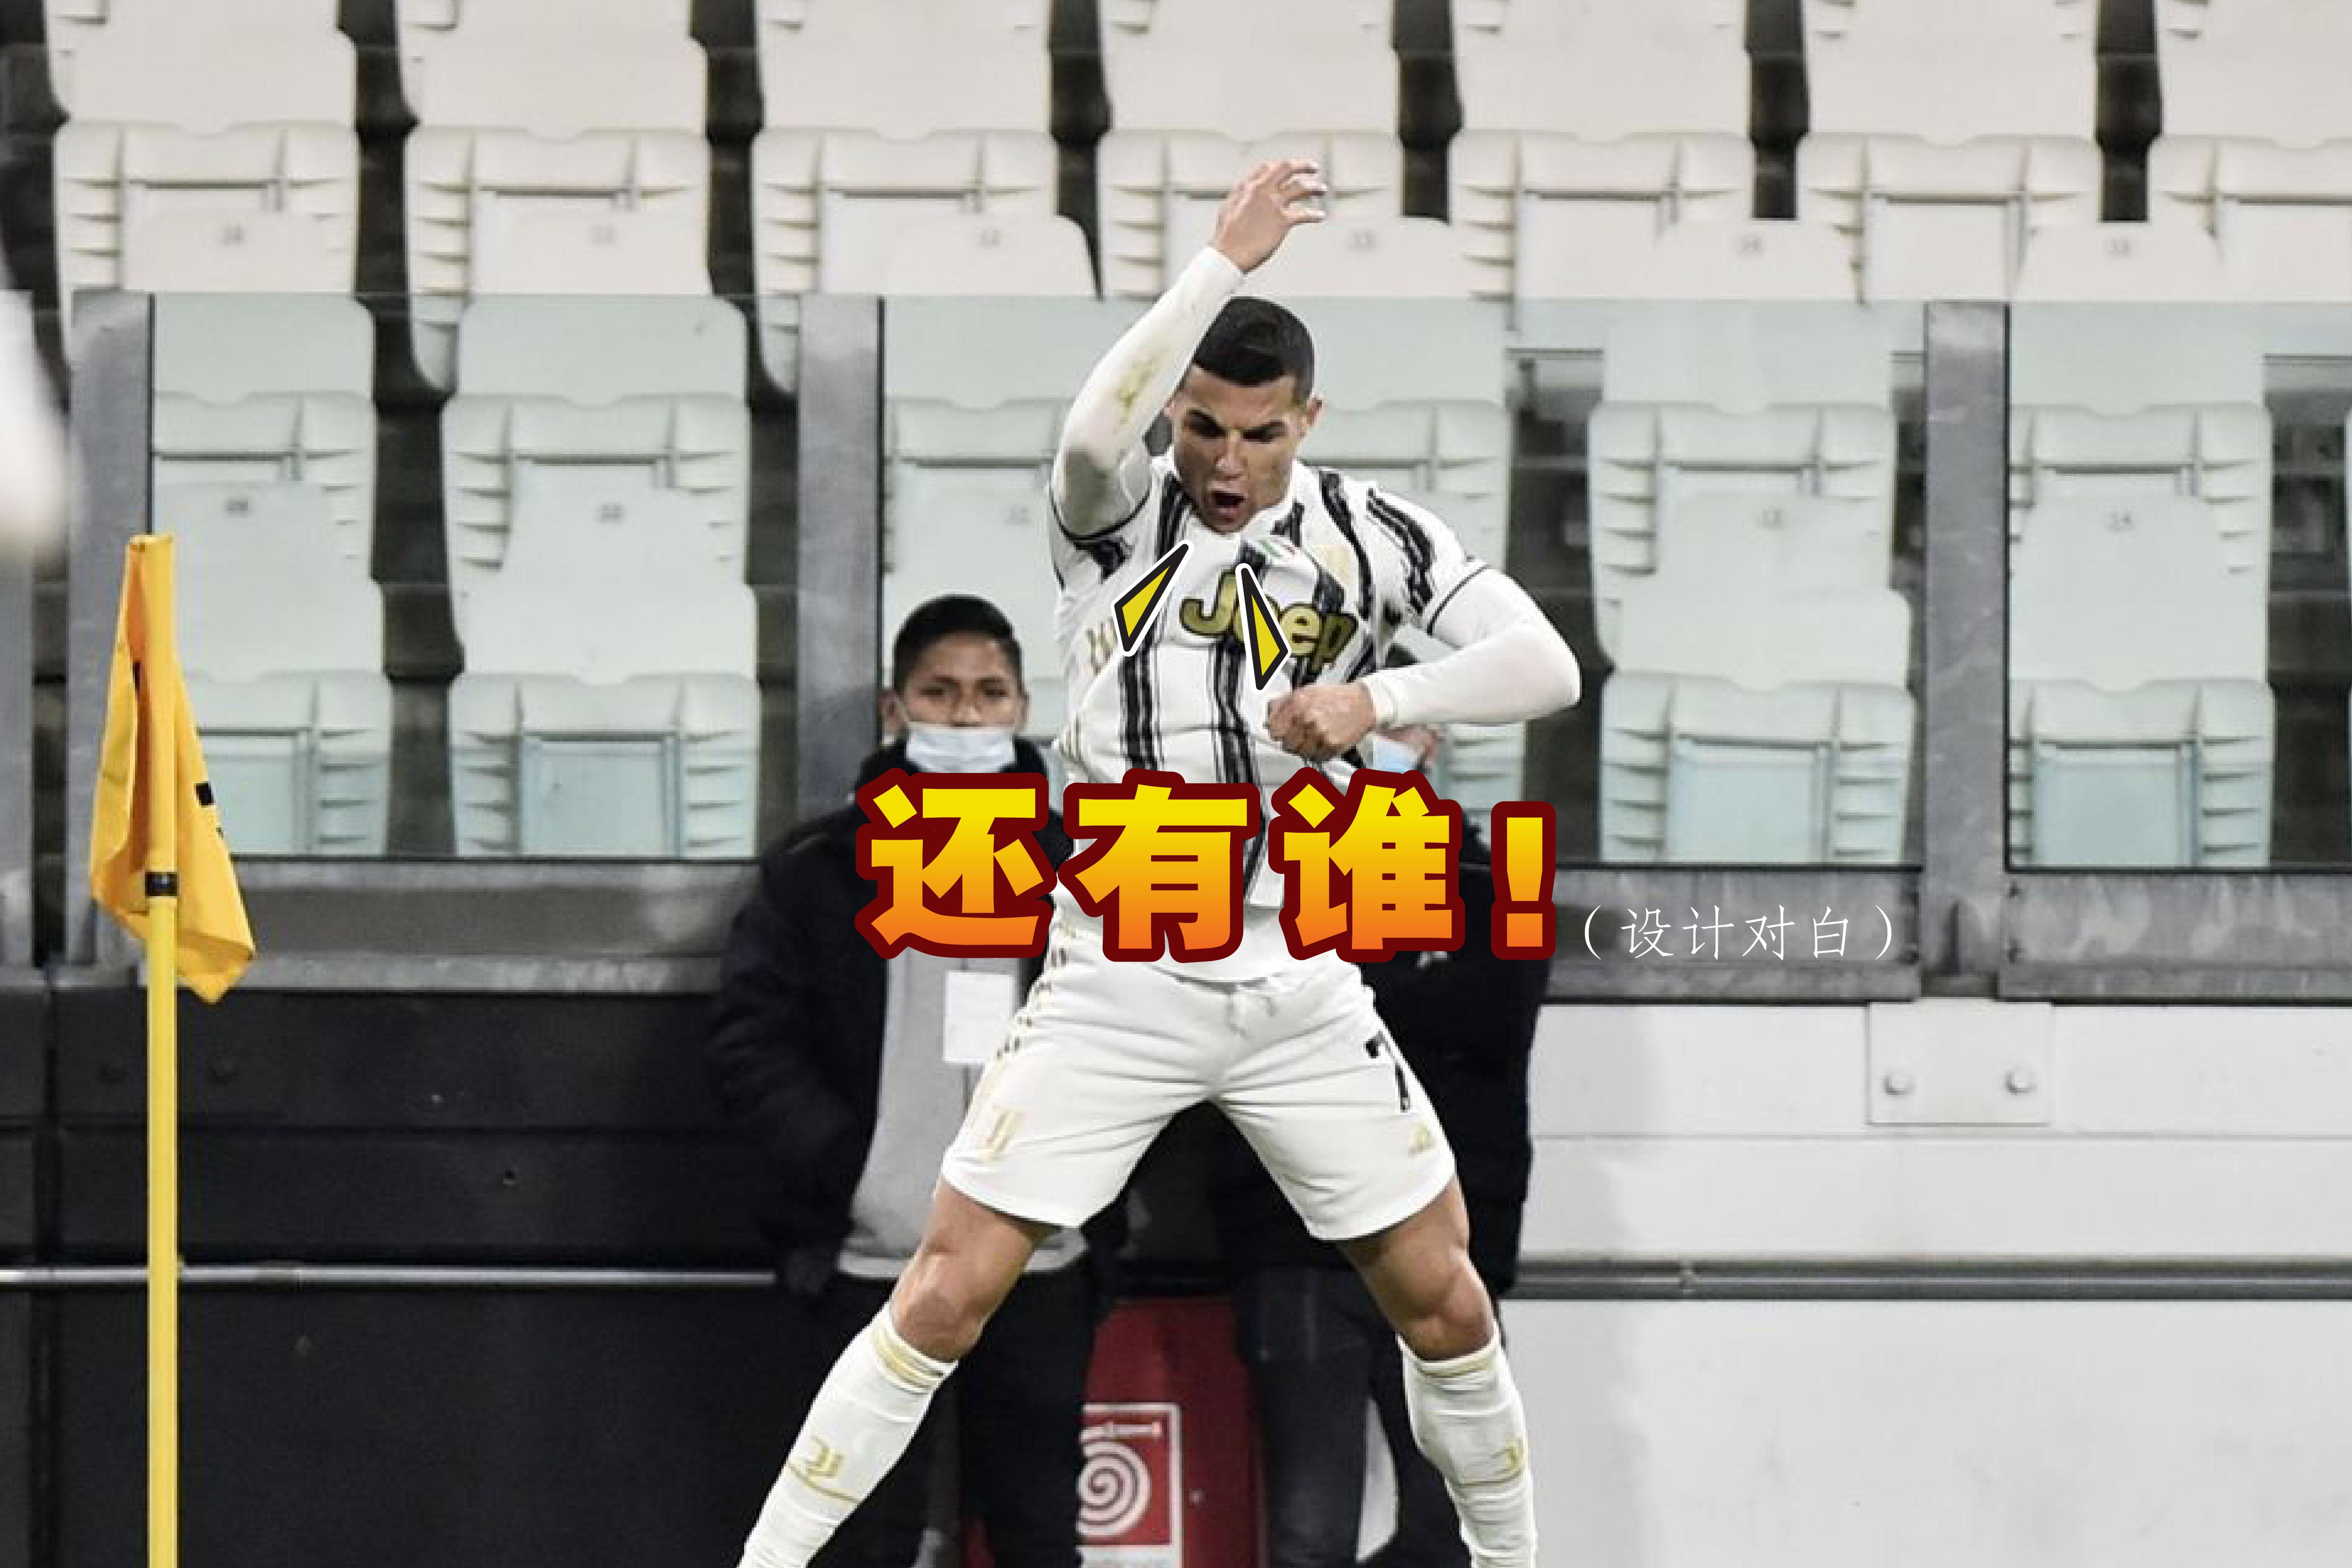 "C罗纳多在与卡利亚里的比赛中,上演职业生涯第二快的帽子戏法,并打破""球王""比利的进球纪录!-路透社/精彩大马制图-"